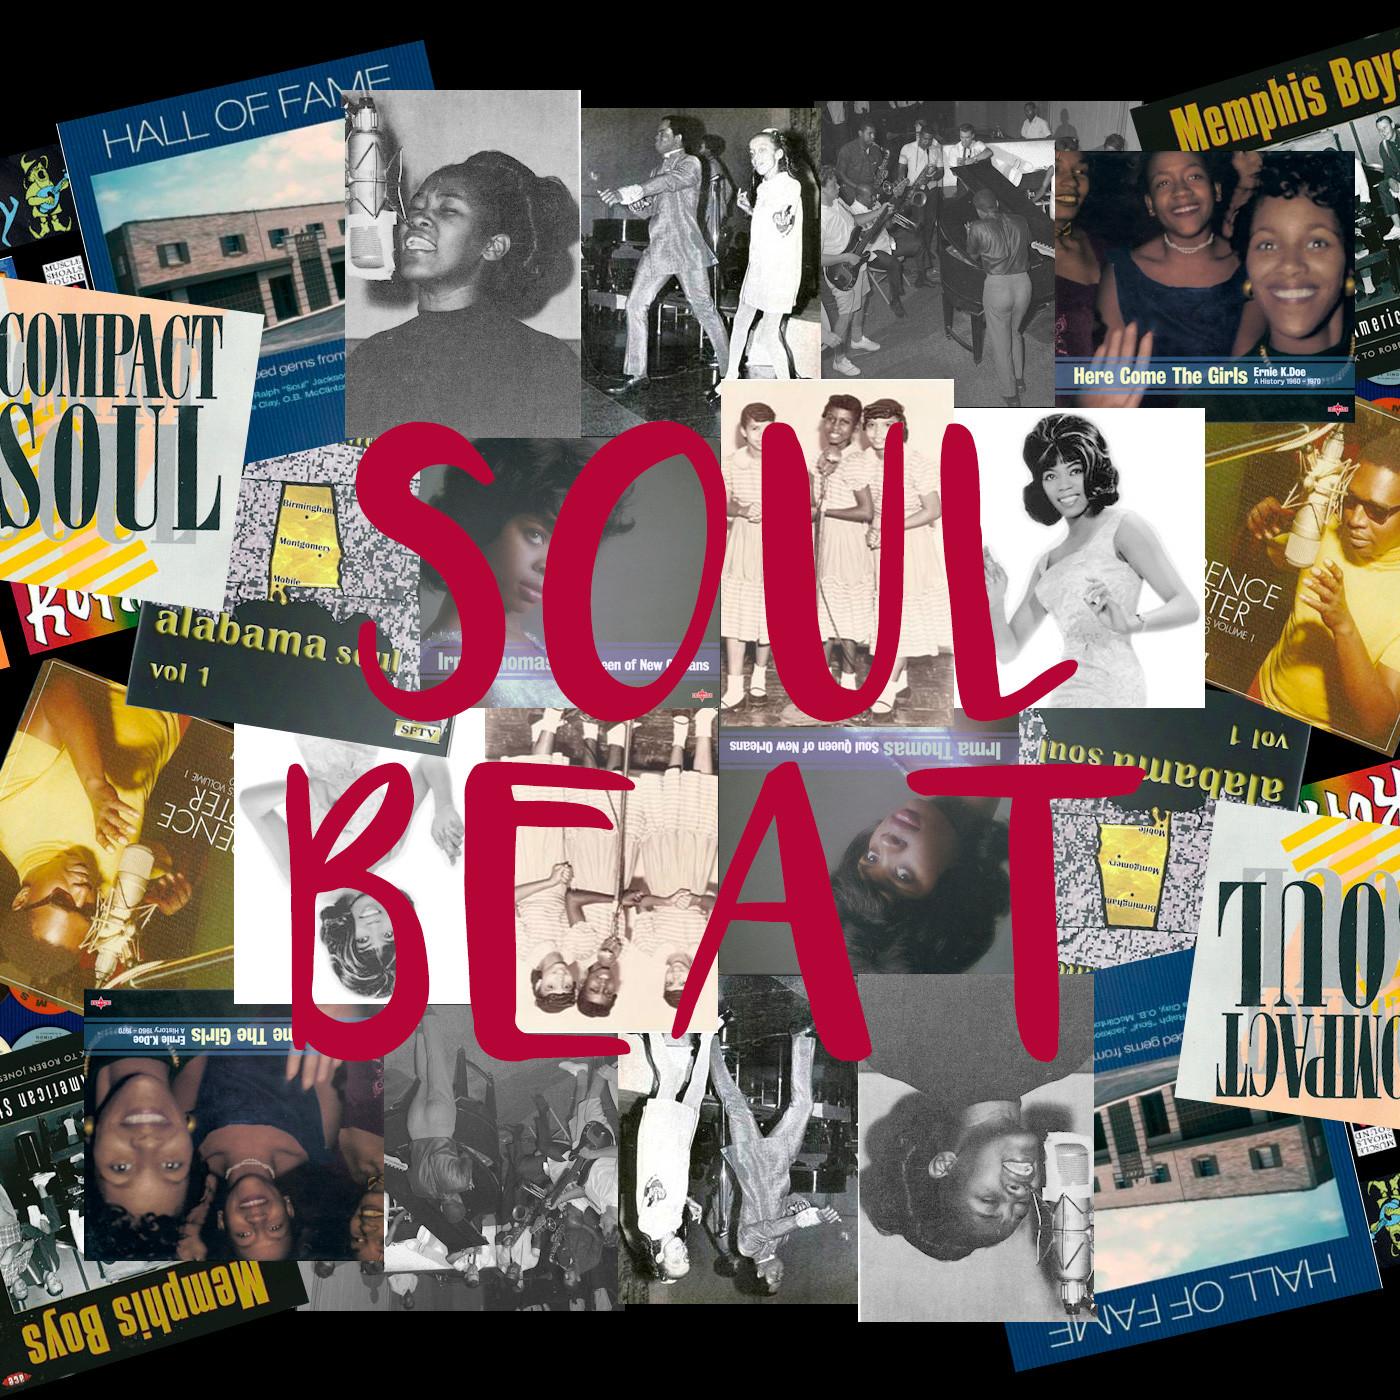 Soulbeat - Professor Longhair (19/10/20)